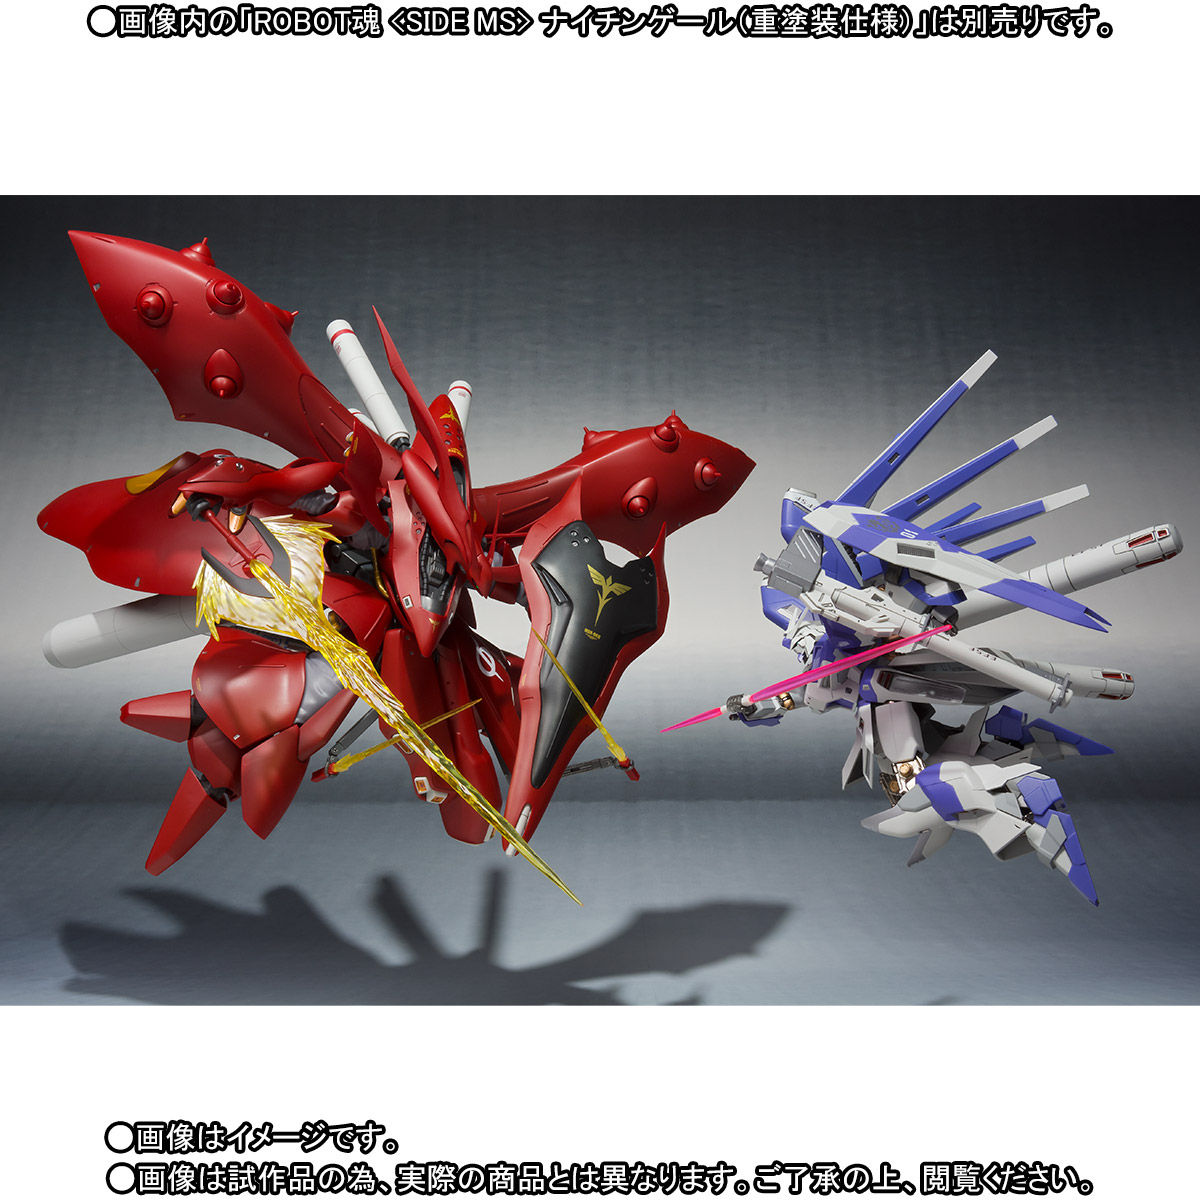 METAL ROBOT魂〈SIDE MS〉『Hi-νガンダム』逆襲のシャア 可動フィギュア-008